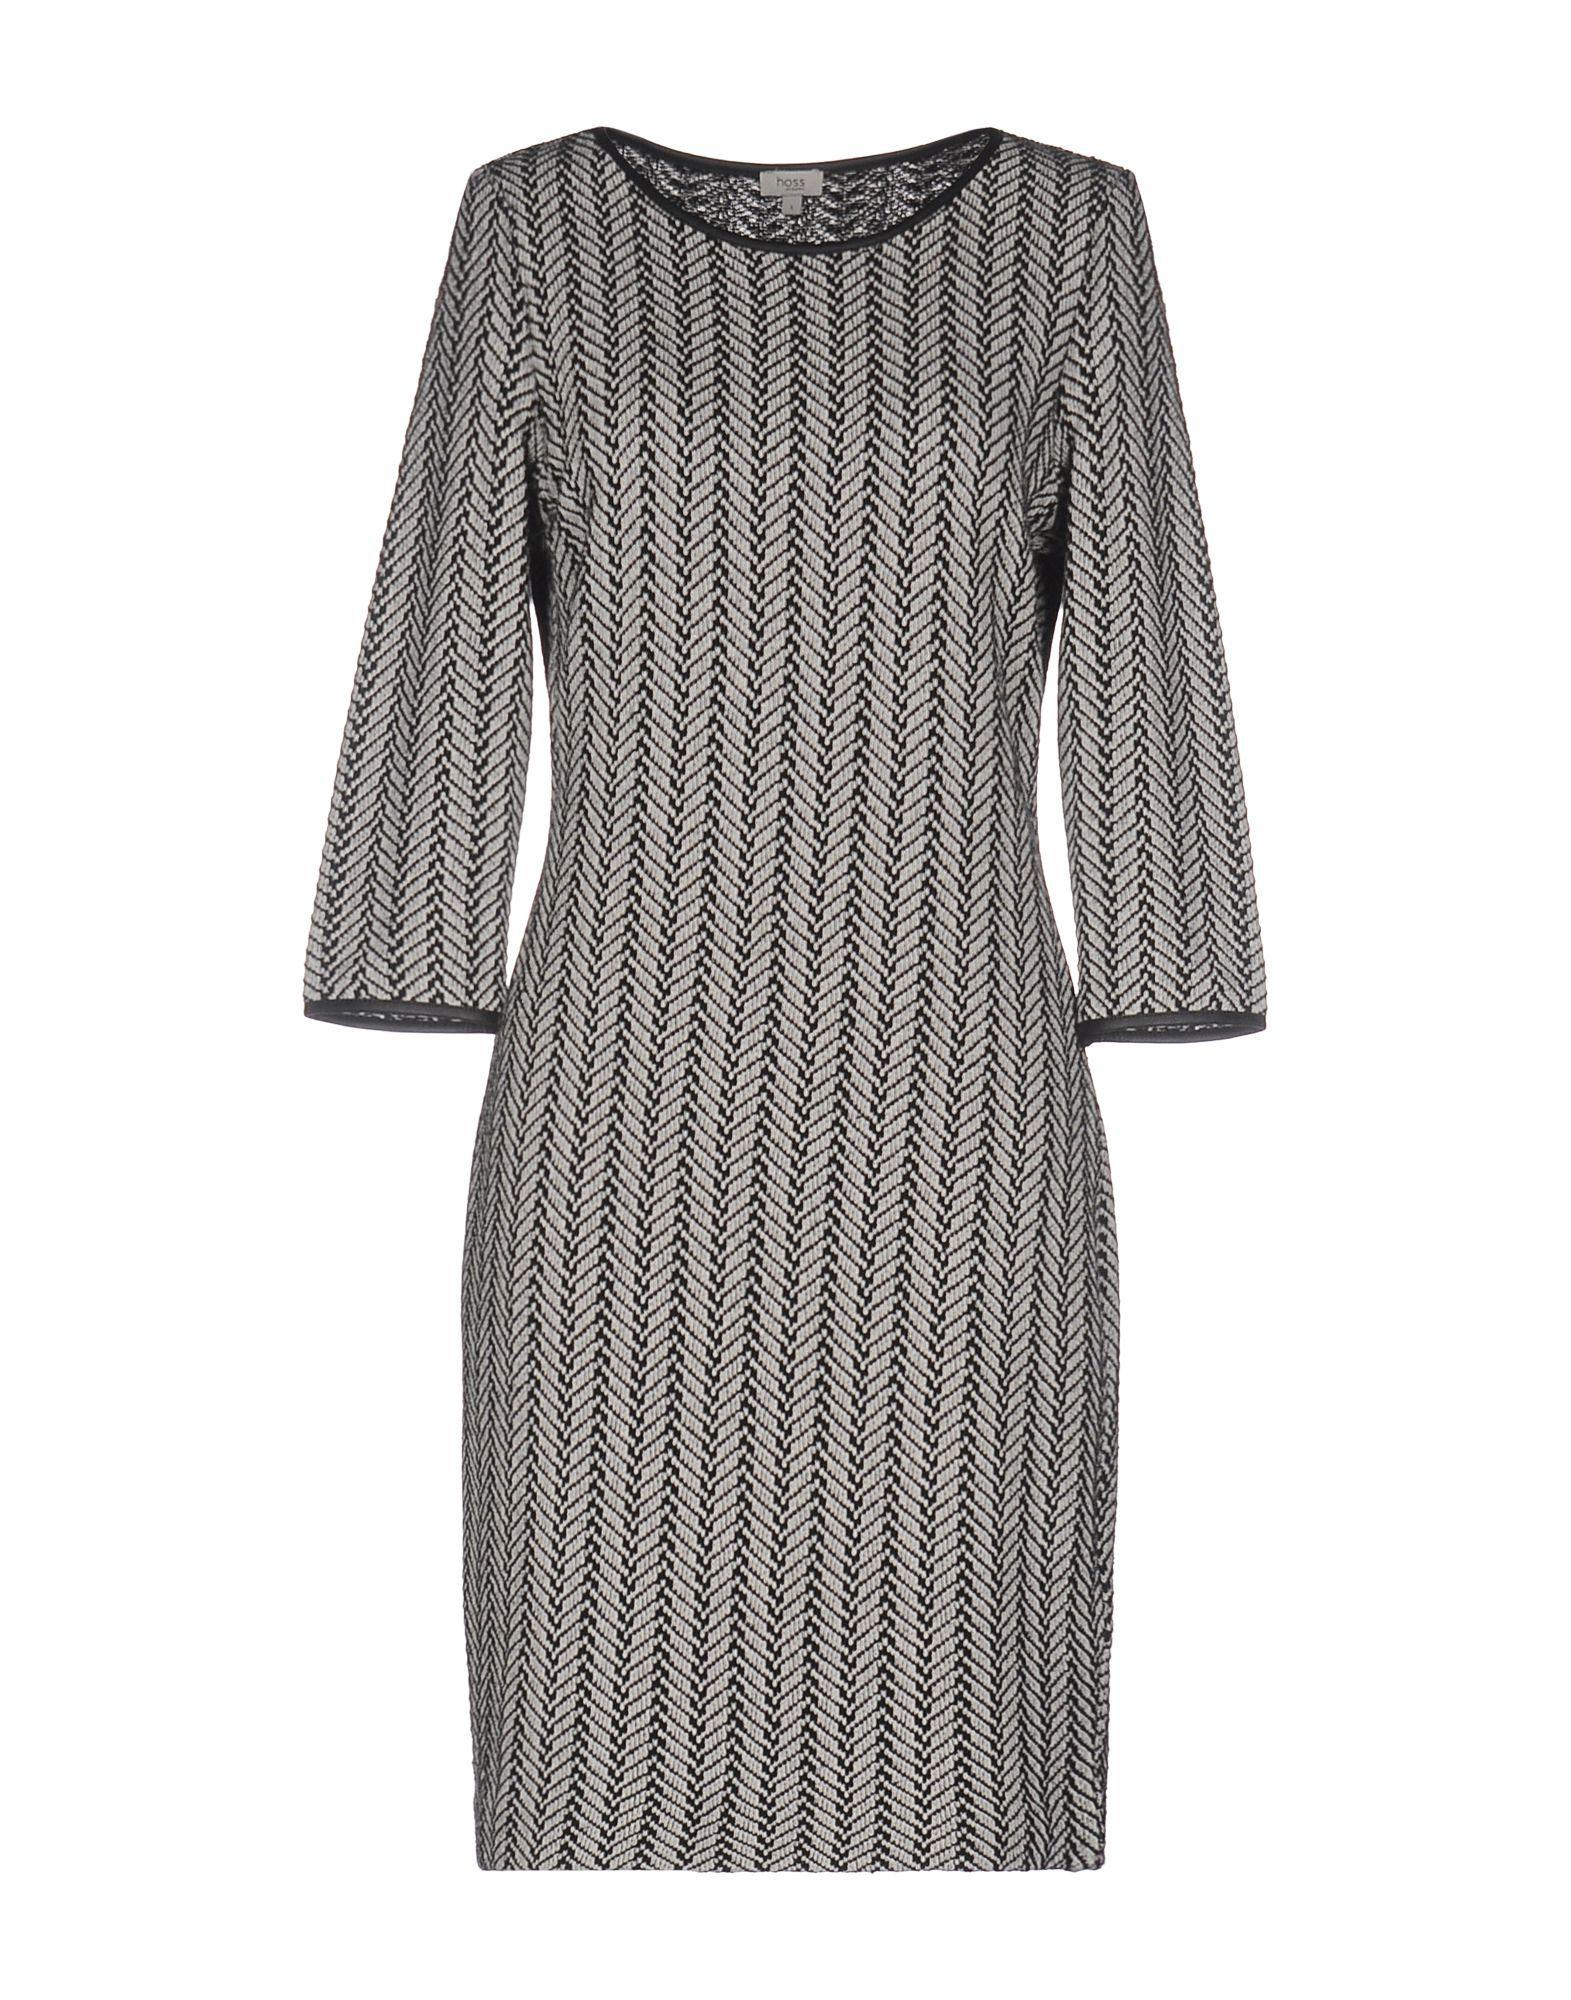 Dress Intropia Black Women's Cotton